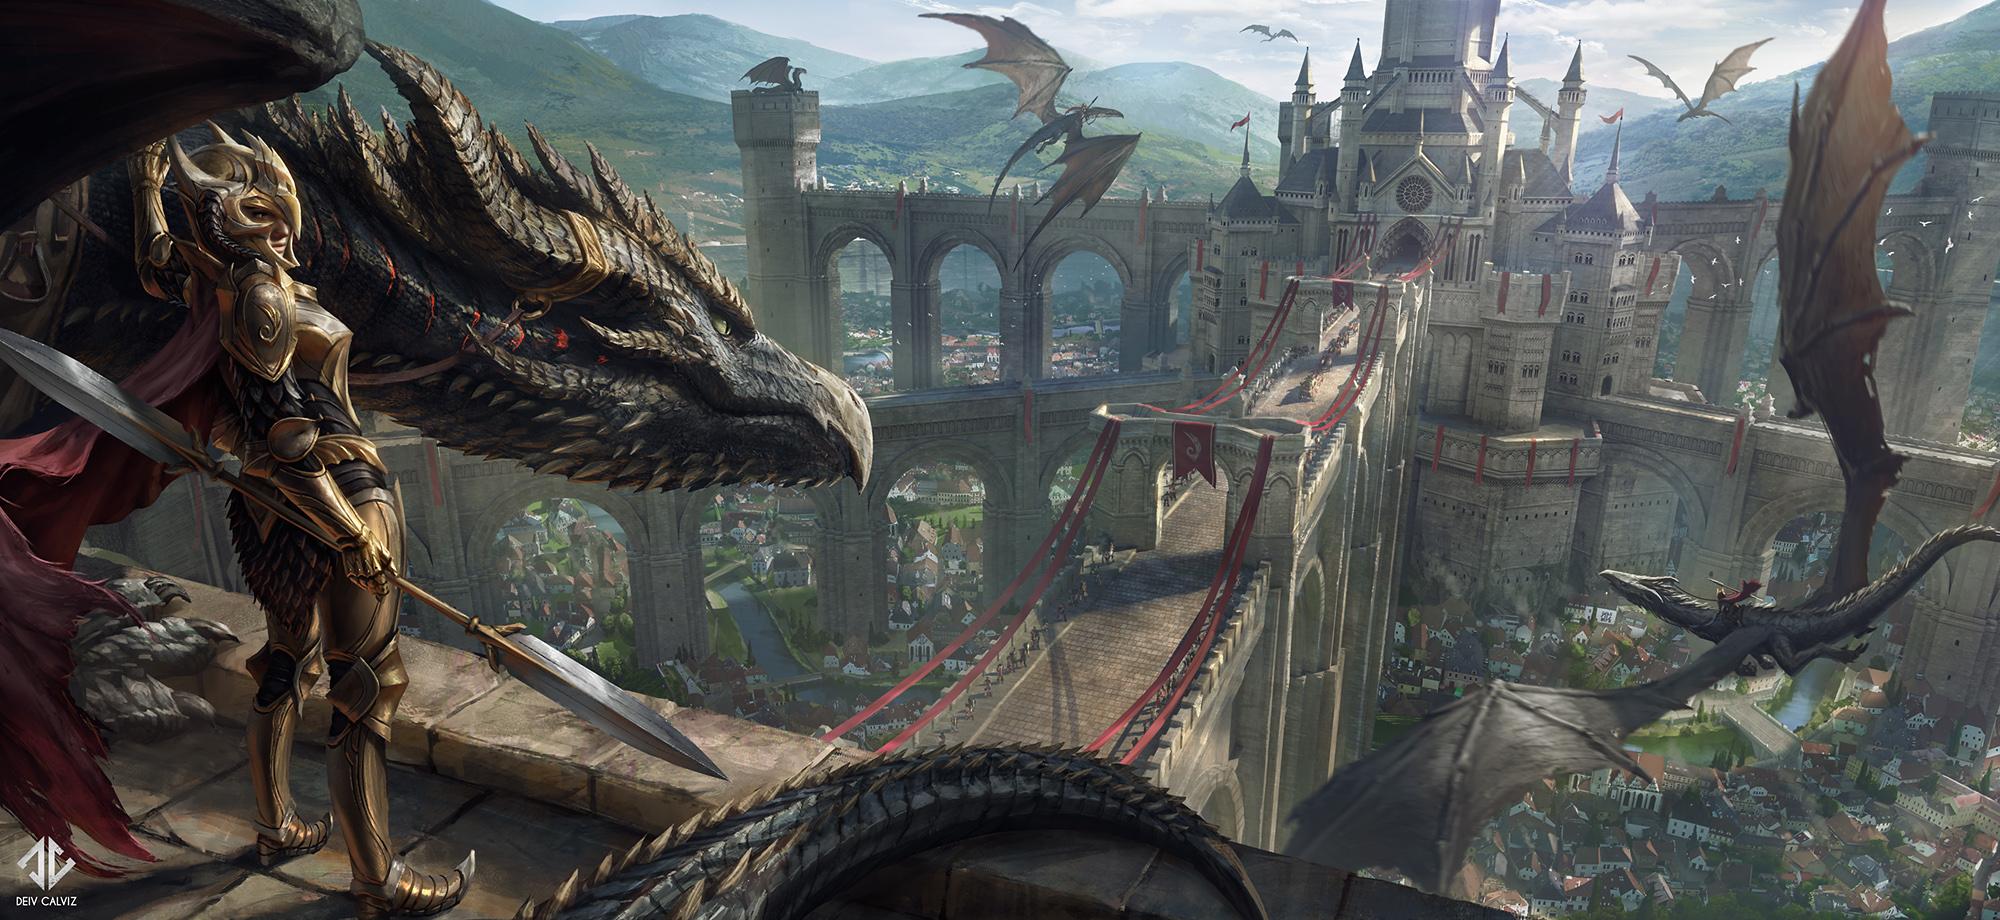 1071-dragon-watchers-deiv-calviz